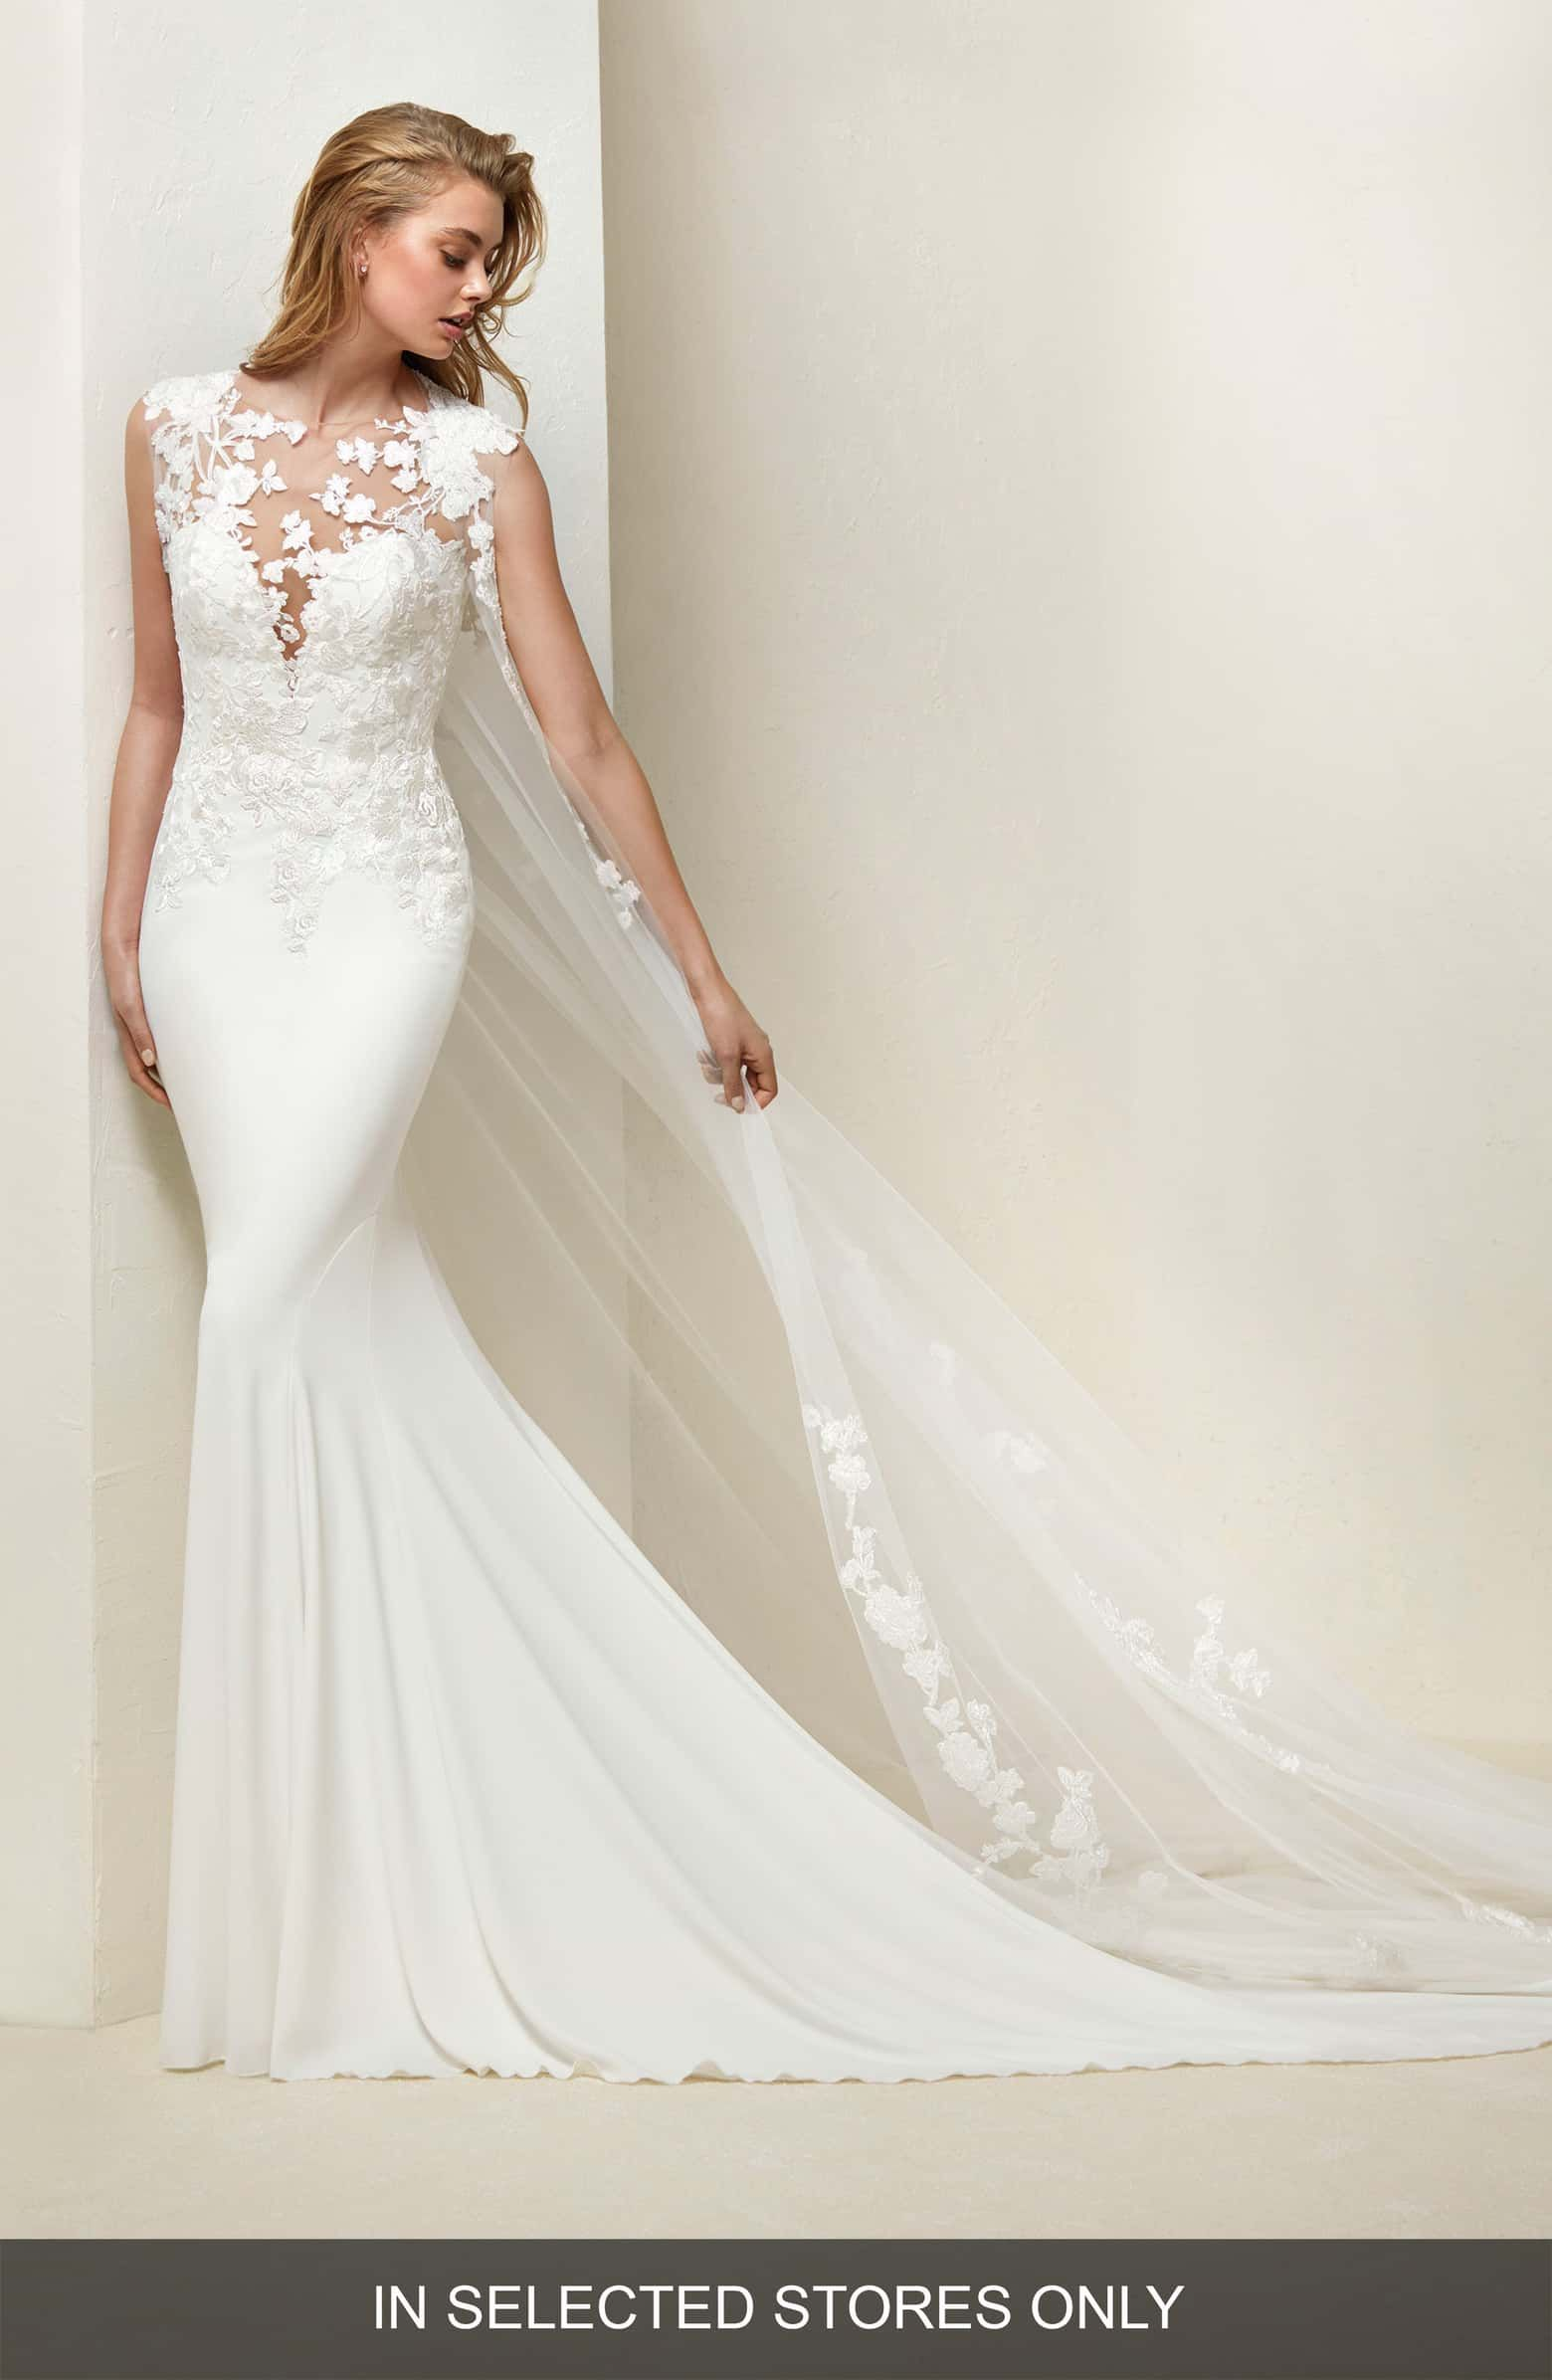 Preloved pronovias wedding dresses  Drail Tulle u Crepe Mermaid Gown Main color OFF WHITE  Pretty